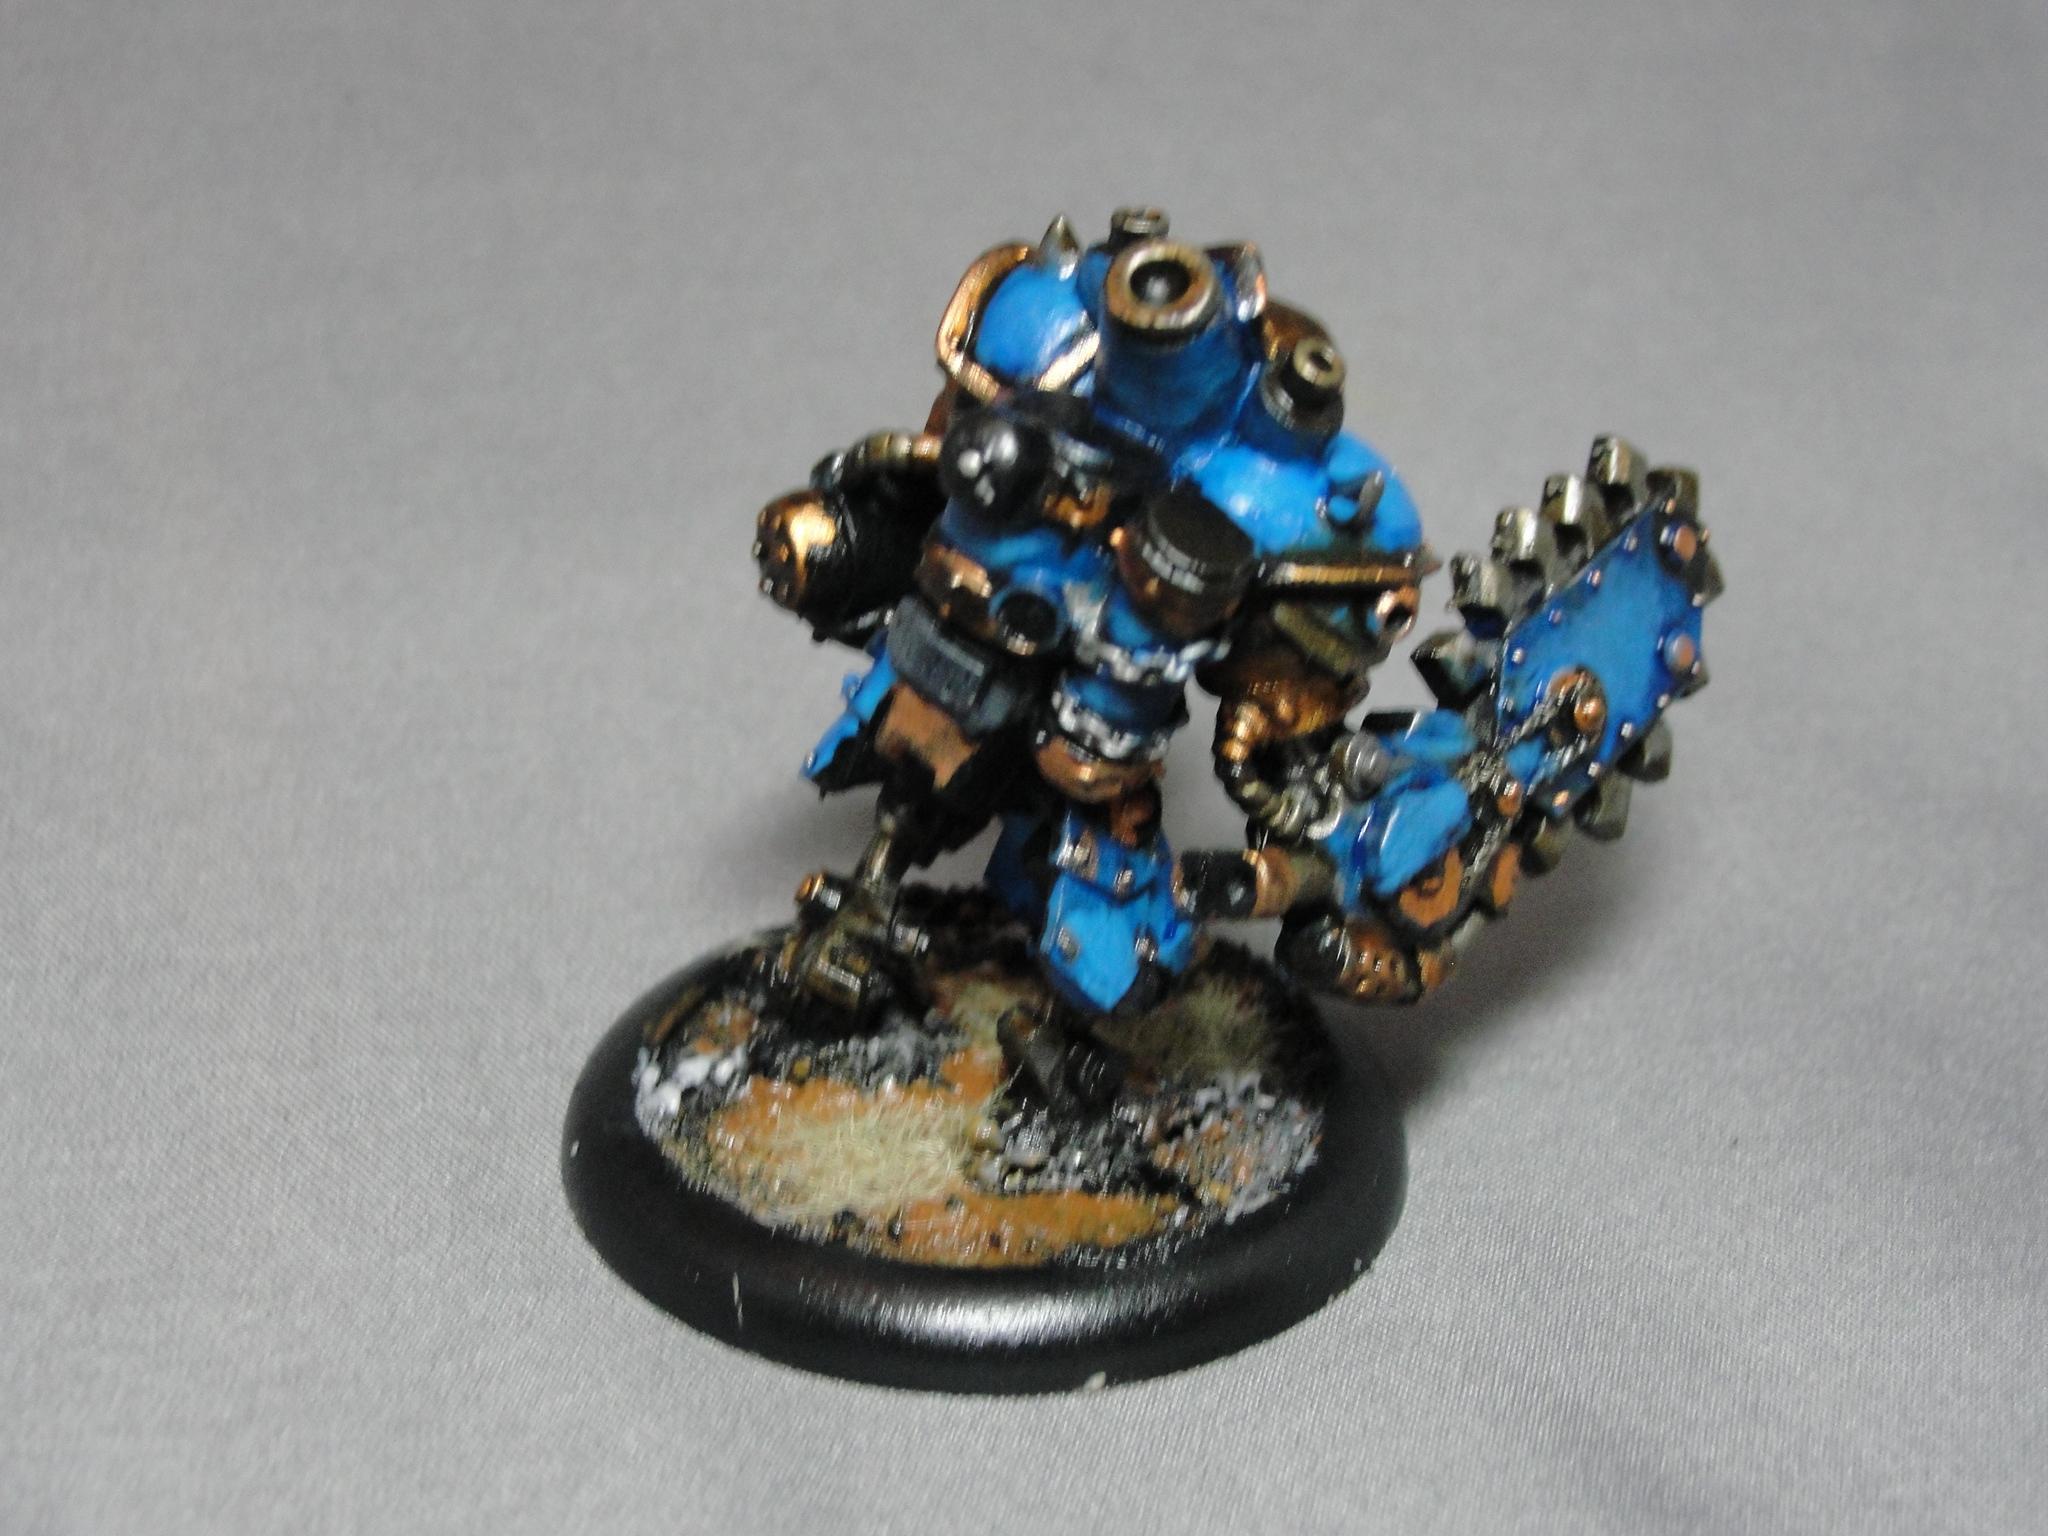 Warmachine, Mercenaries, Renegade